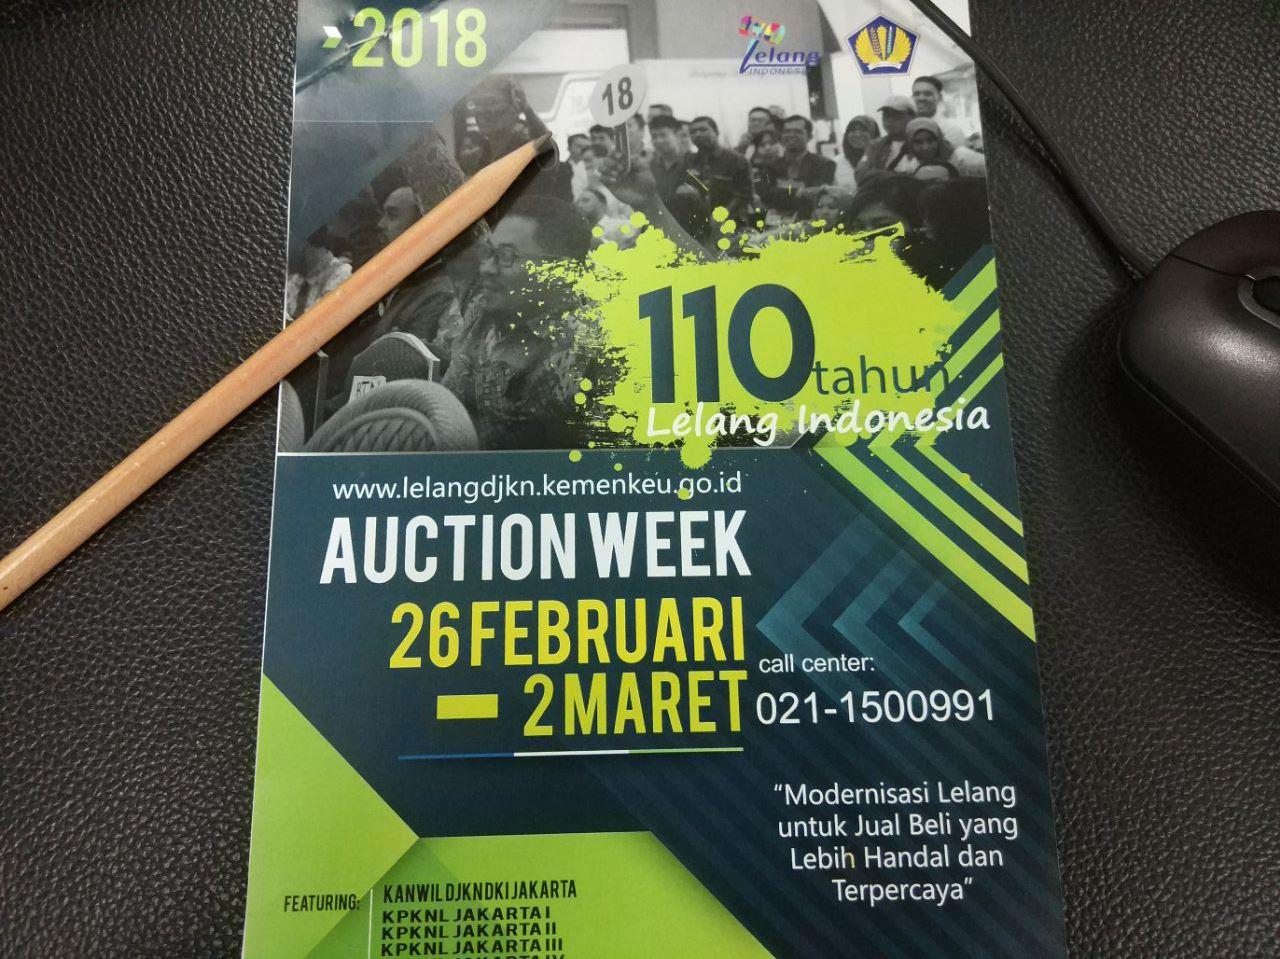 110 Tahun Lelang Indonesia - Tok! Lelang KPKNL Jakarta IV Habis Terjual